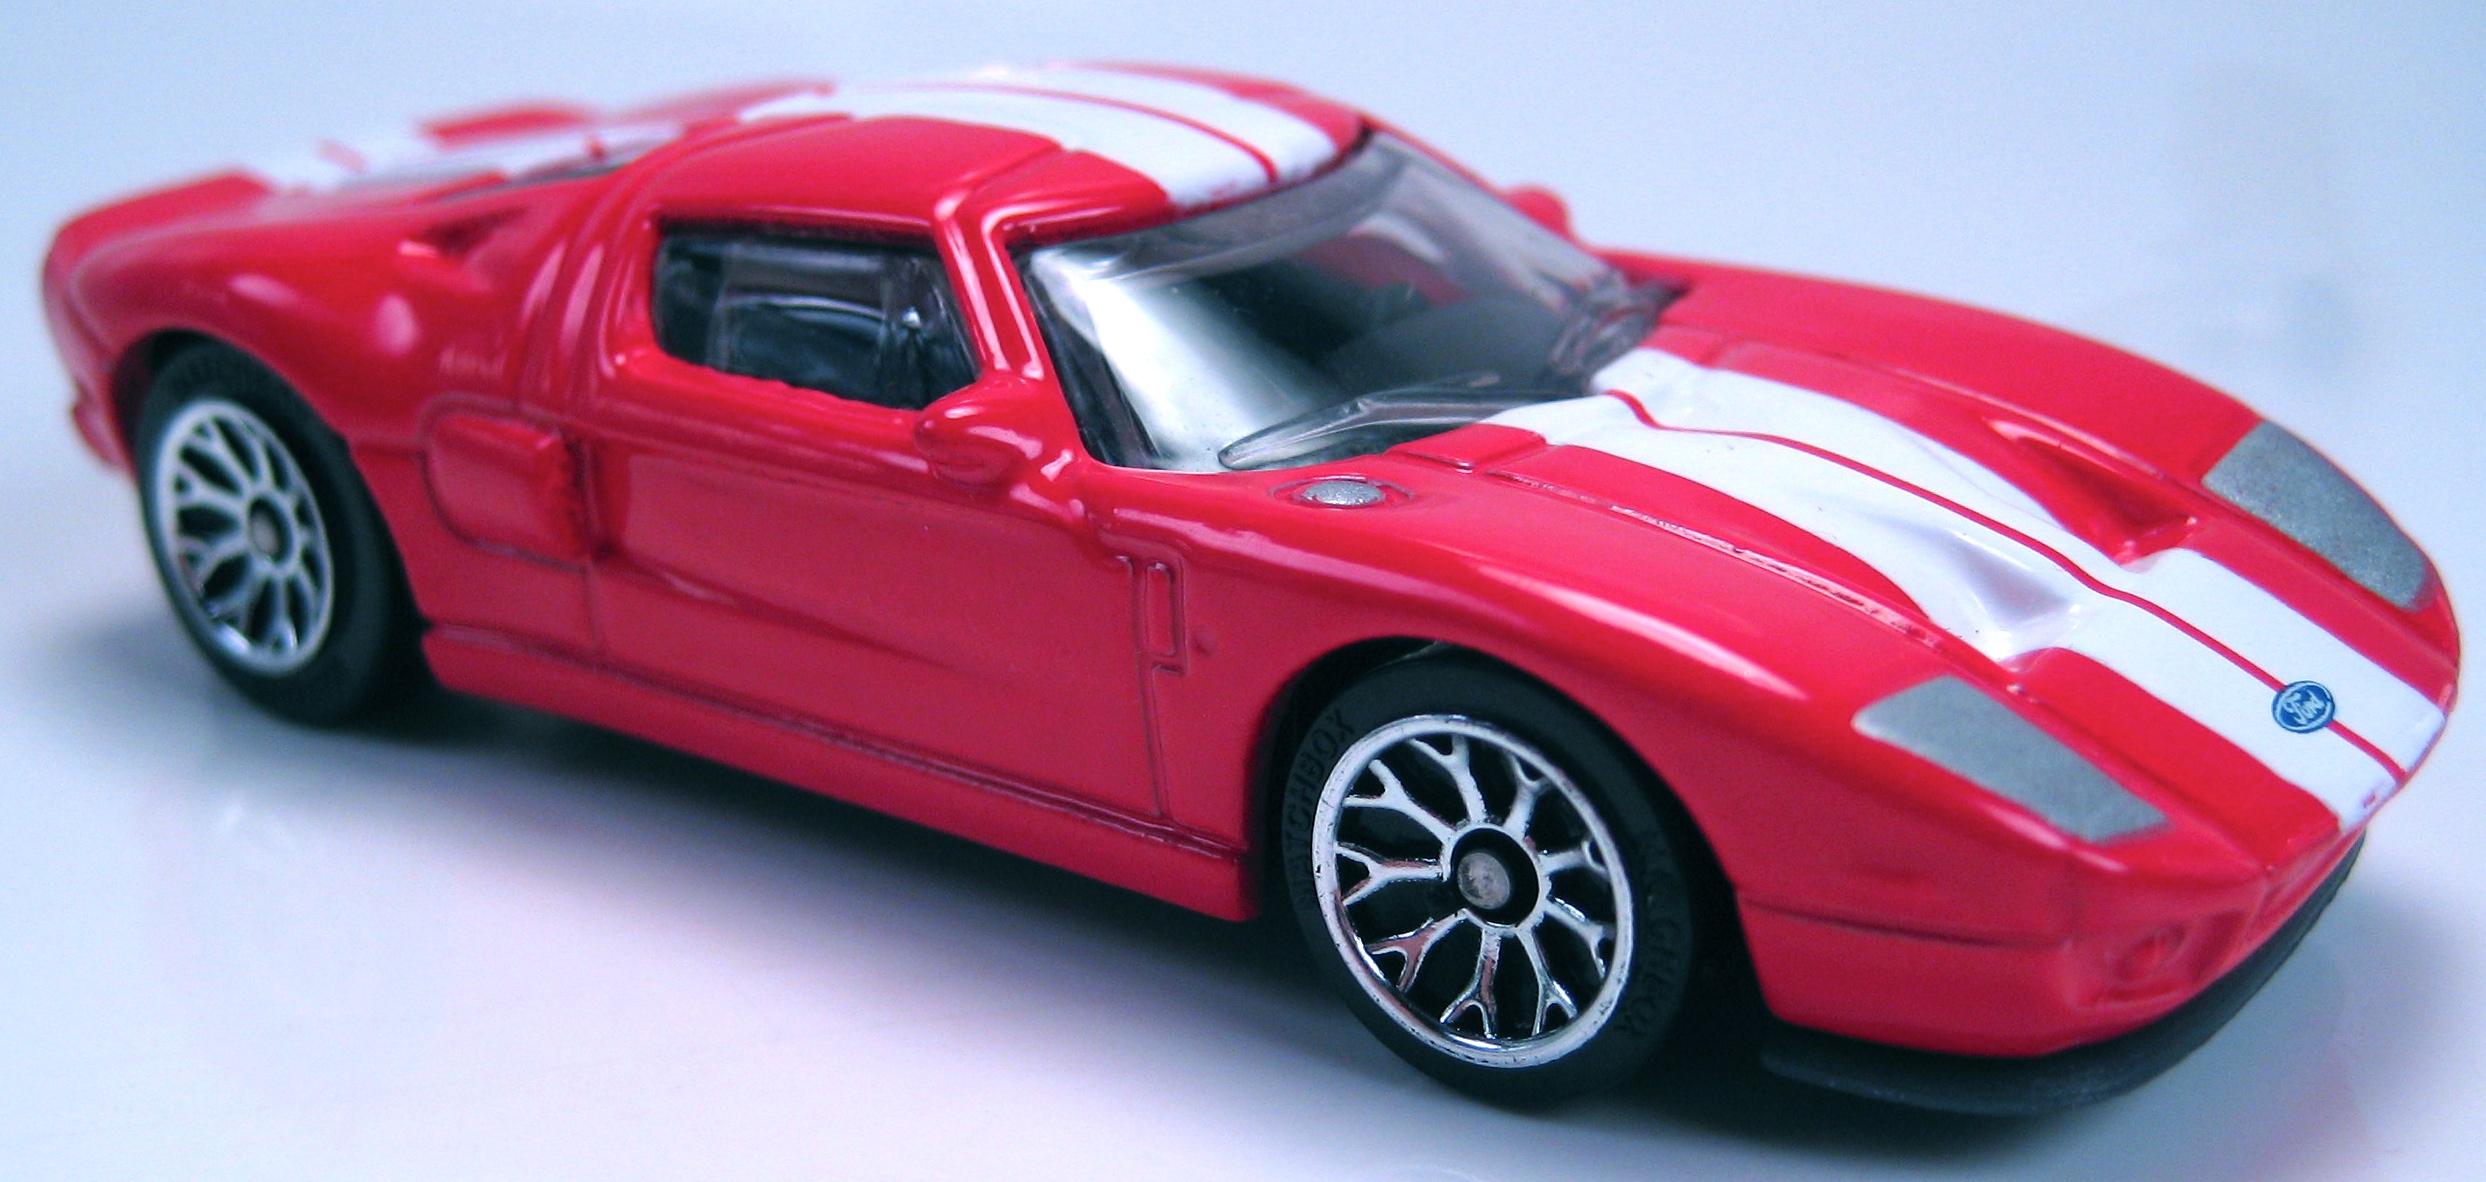 05 Ford GT red.JPG